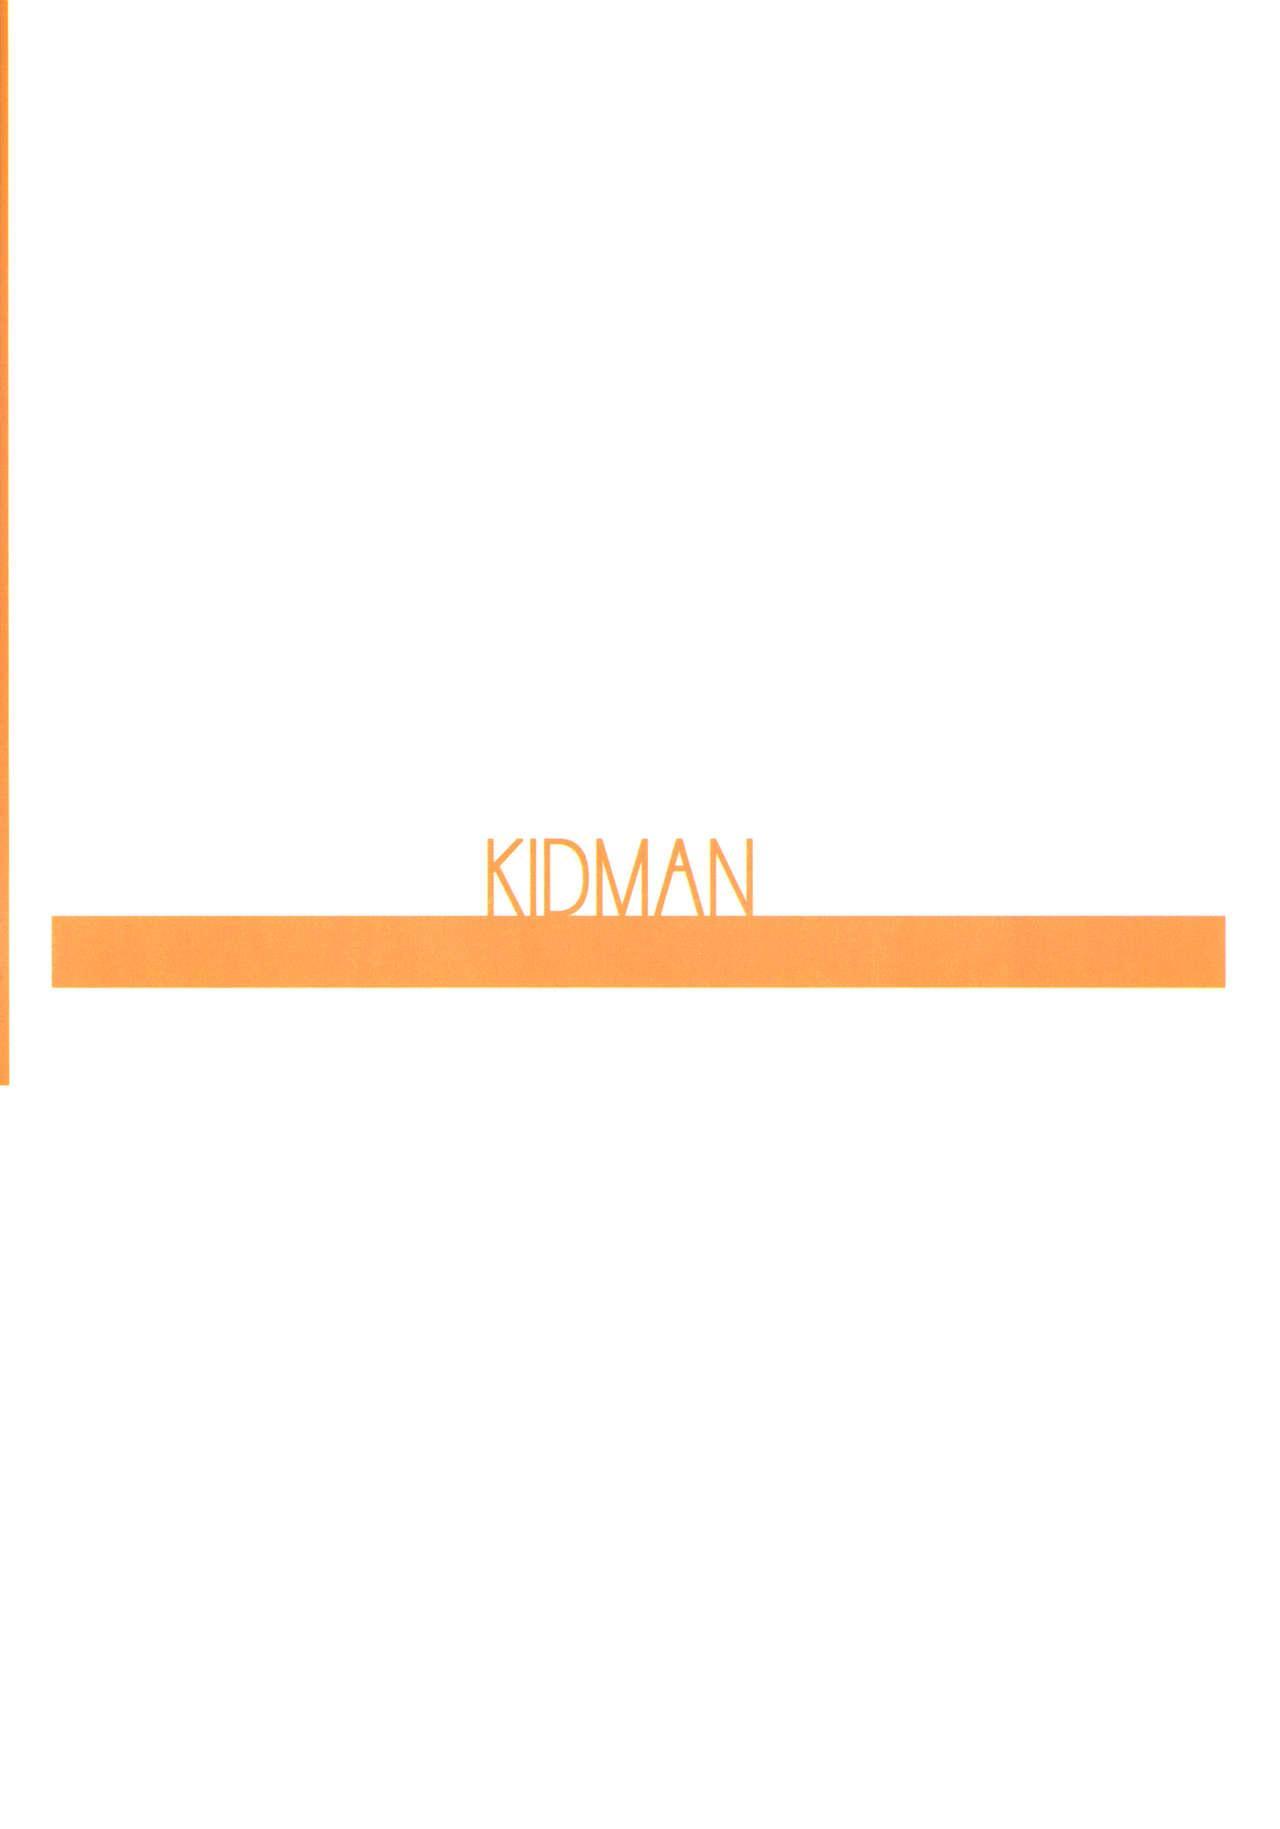 KIDMAN 16